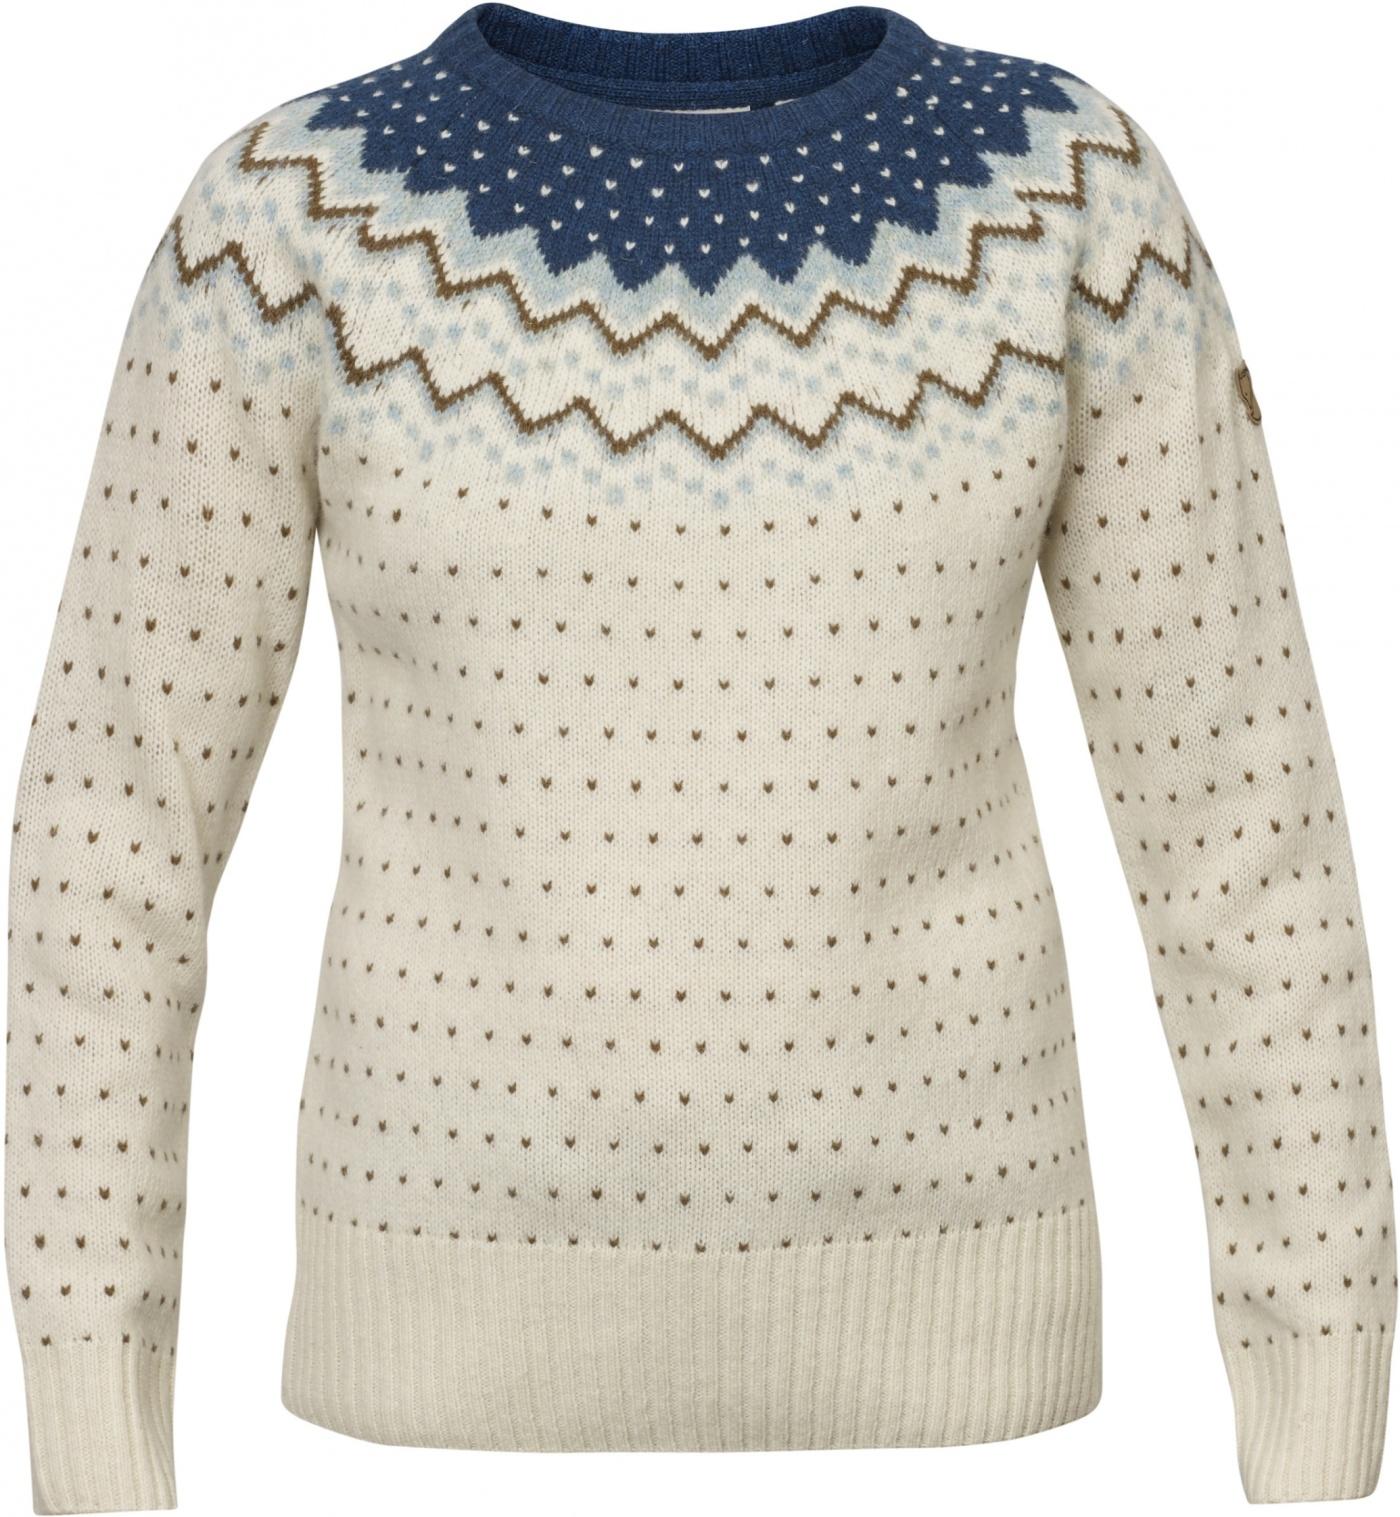 FjallRaven Övik Knit Sweater W. Glacier Green-30